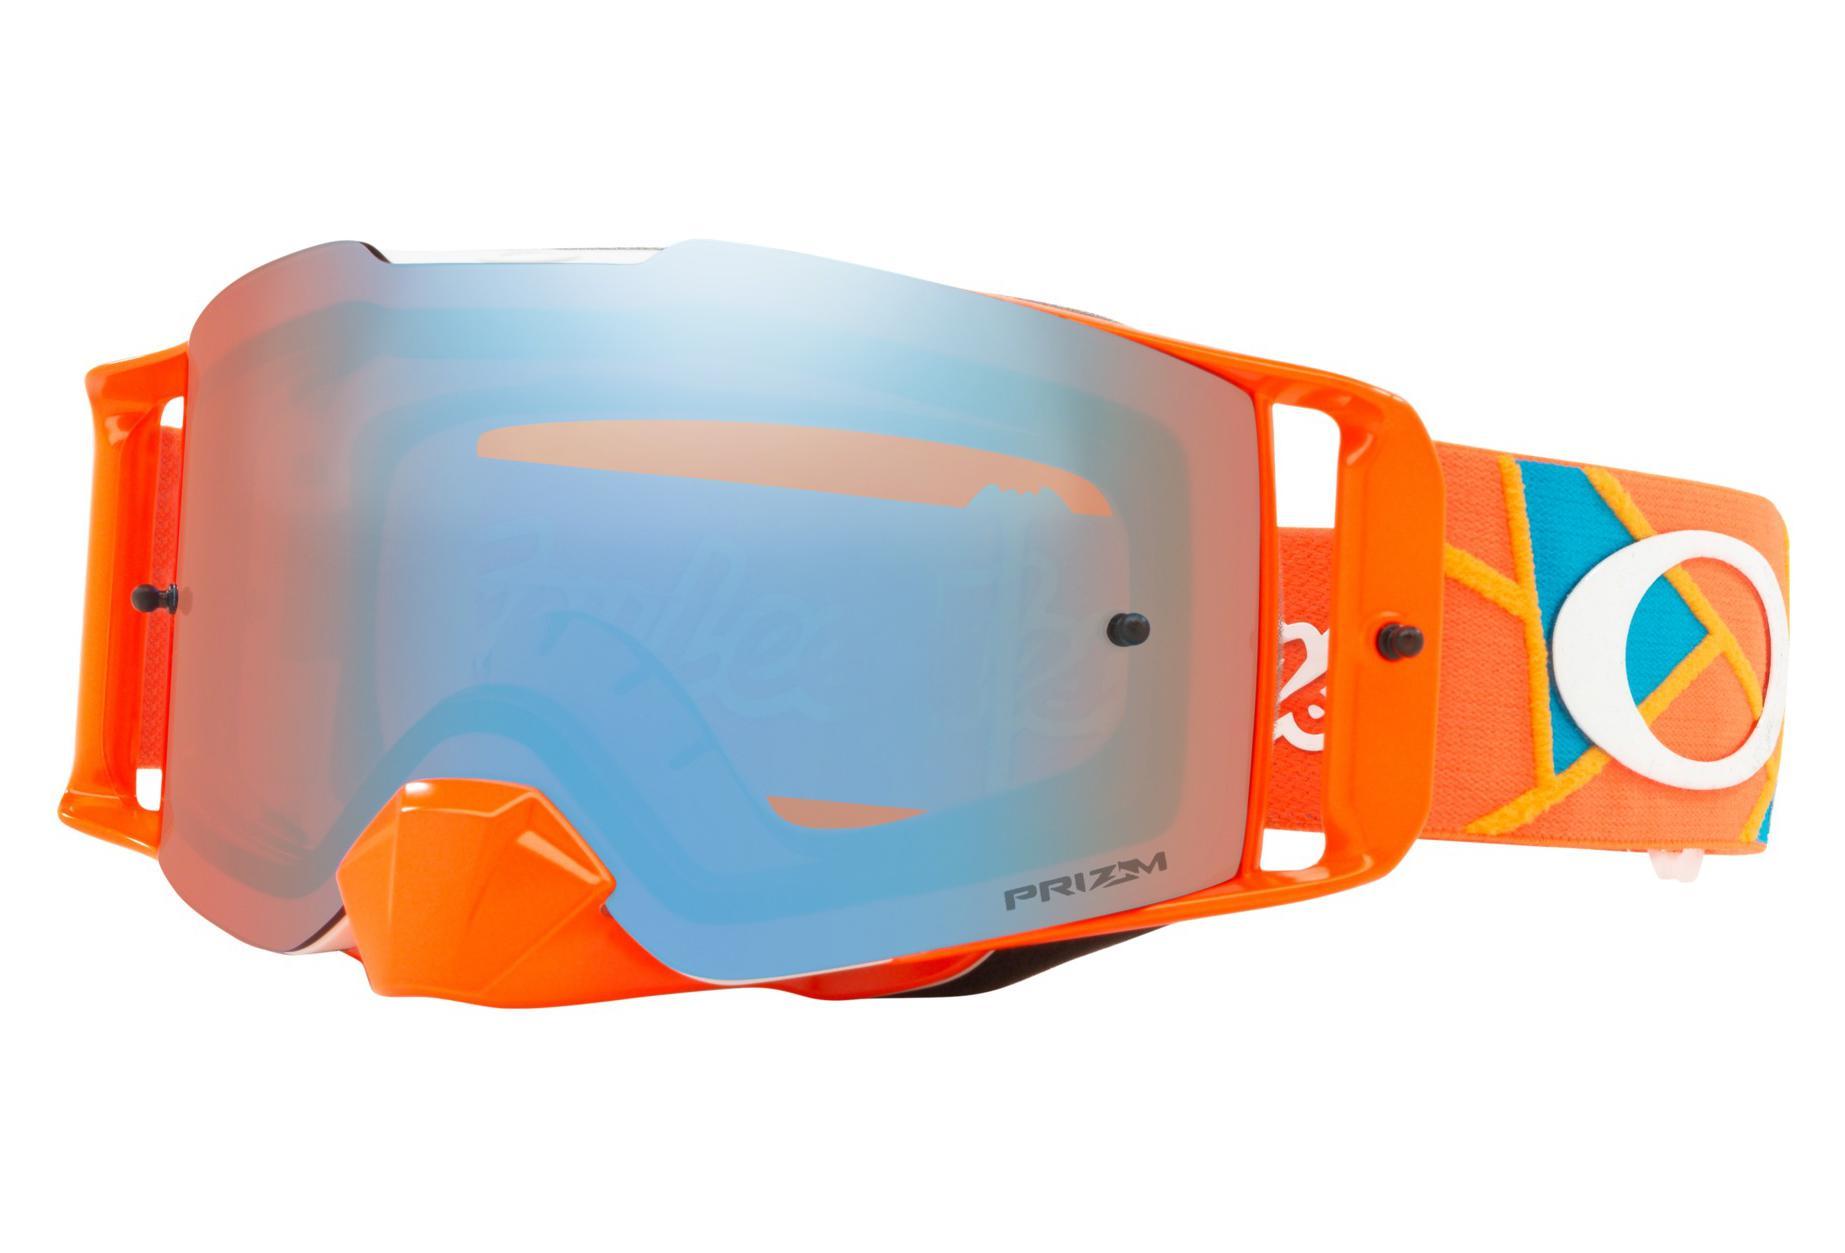 853ac38726b9 Oakley Front Line MX Troy Lee Designs Series   Troy Lee Design Metric Red  Orange   Prizm Mx Sapphire   Ref. OO7087-28